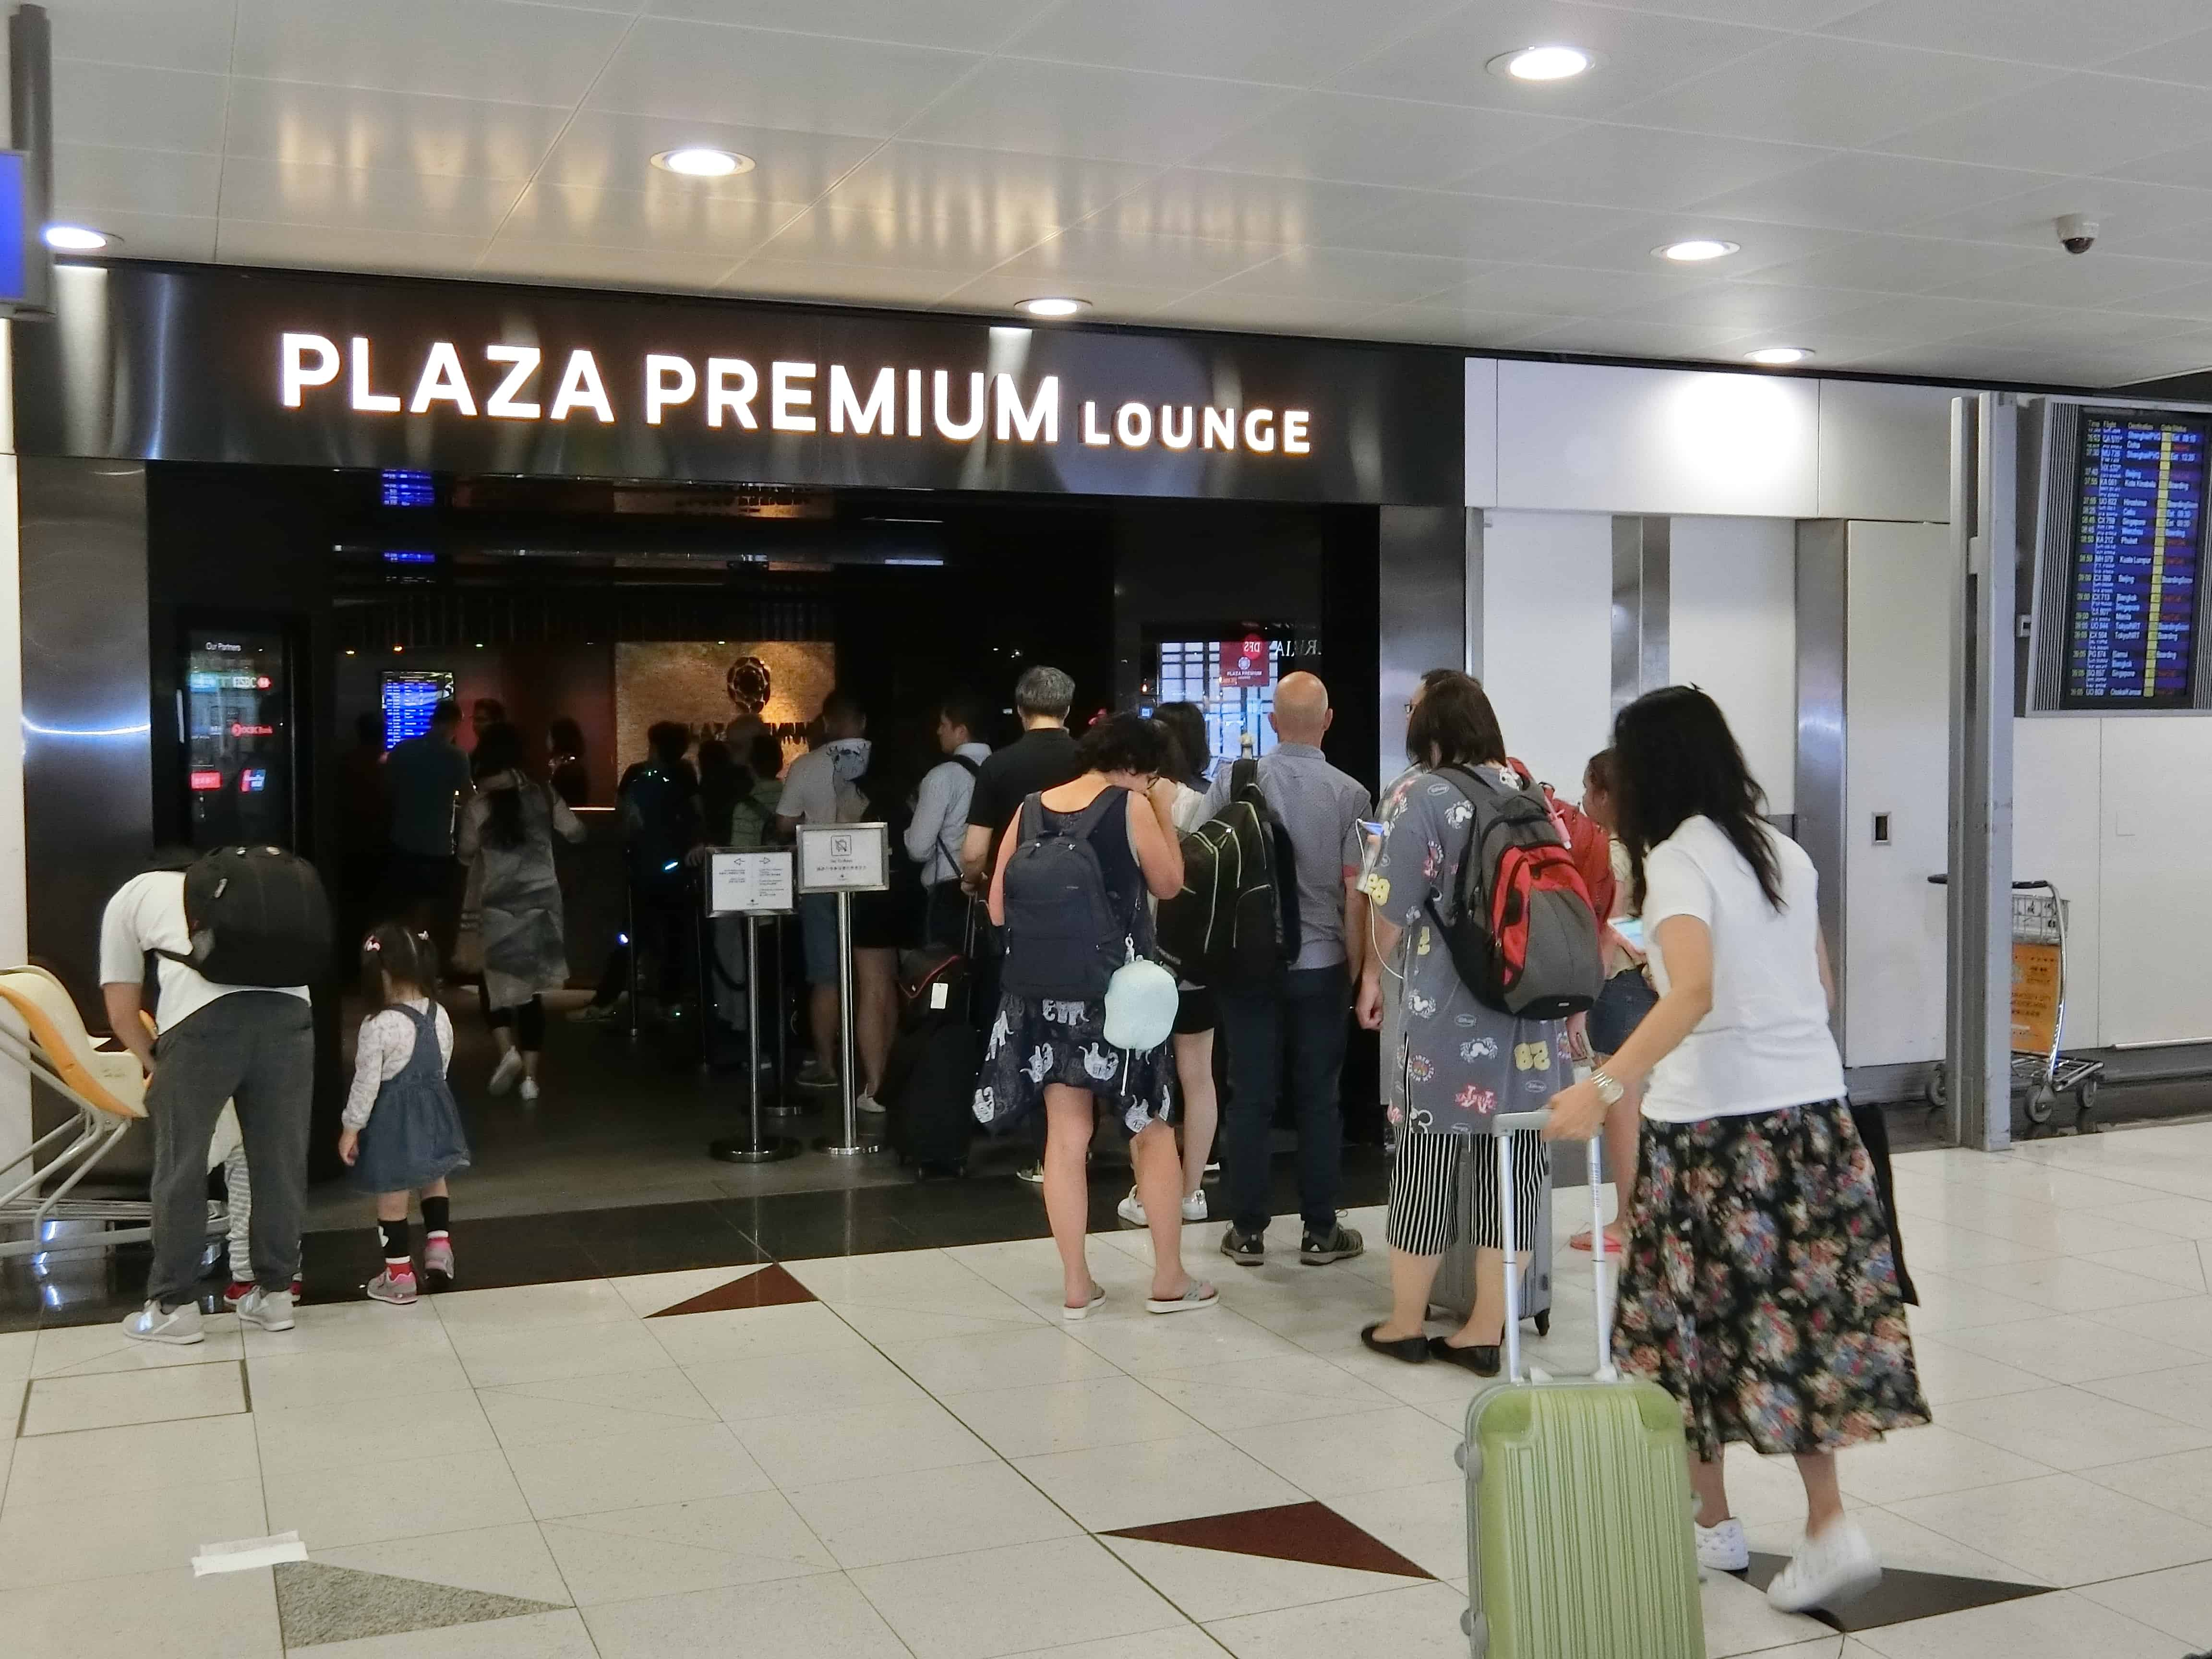 image-of-hong-kong-international-airport-plaza-premium-lounge-entrance